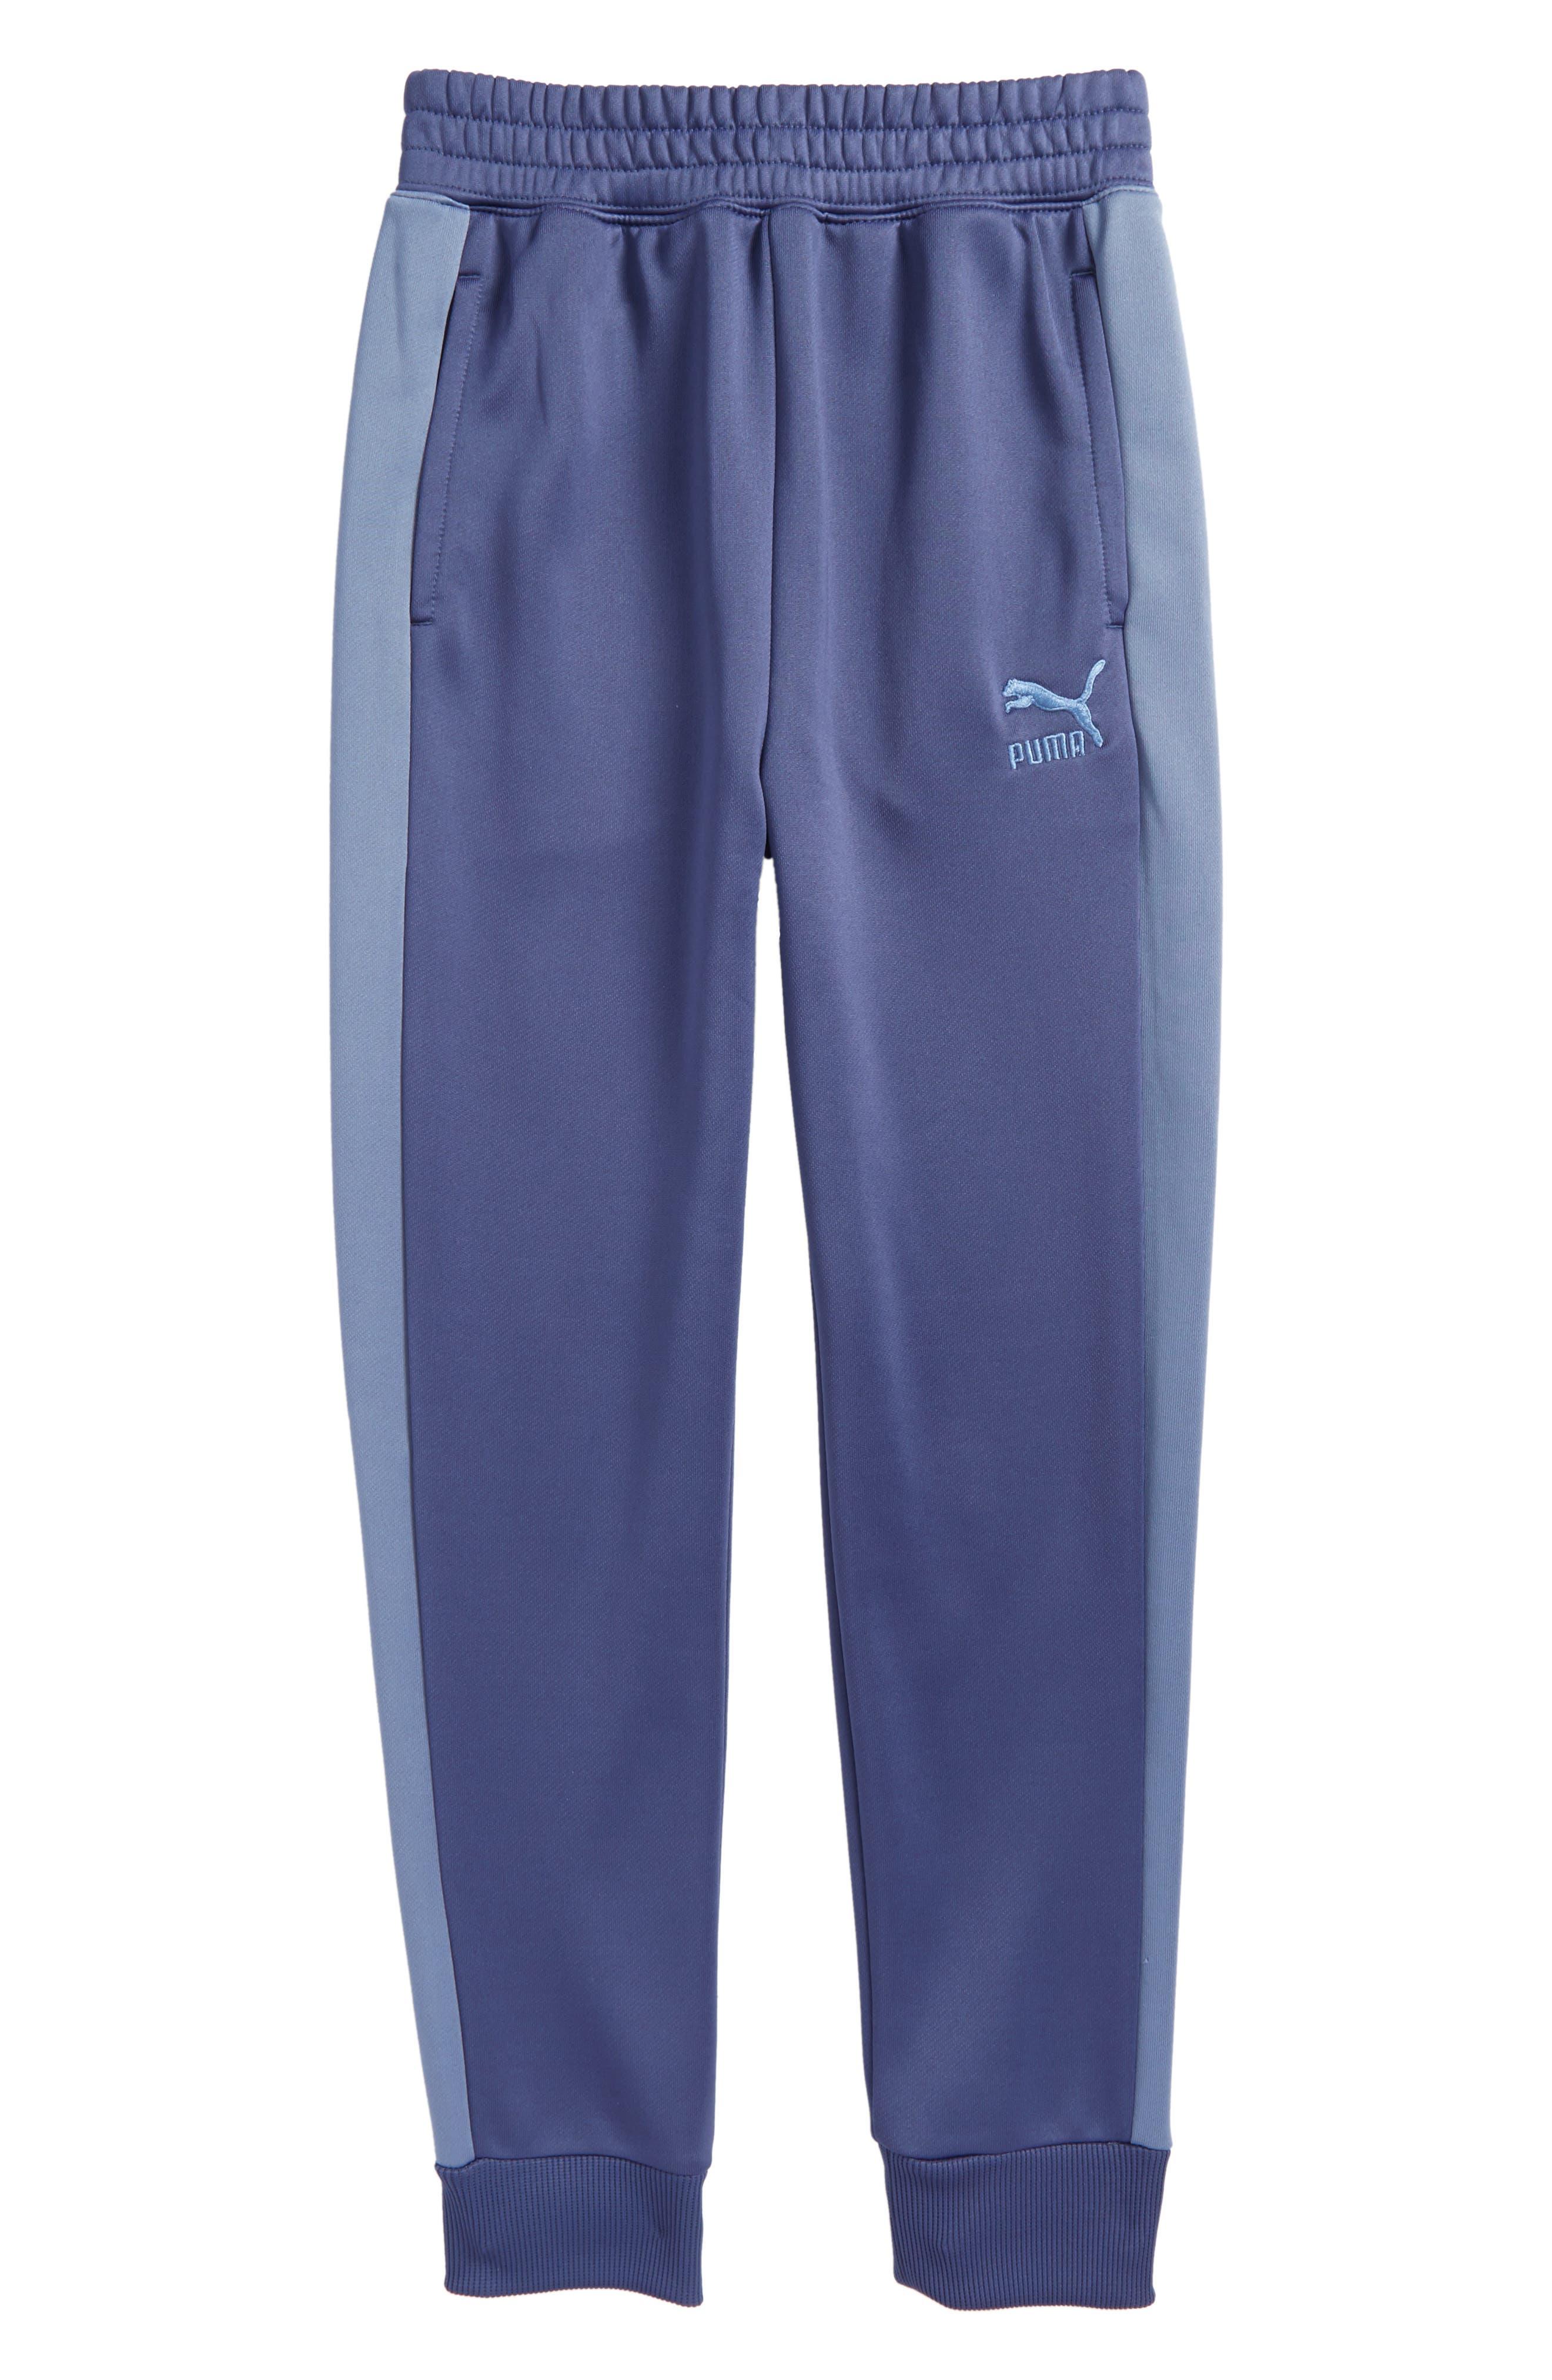 PUMA T7 Sweatpants (Big Boys)